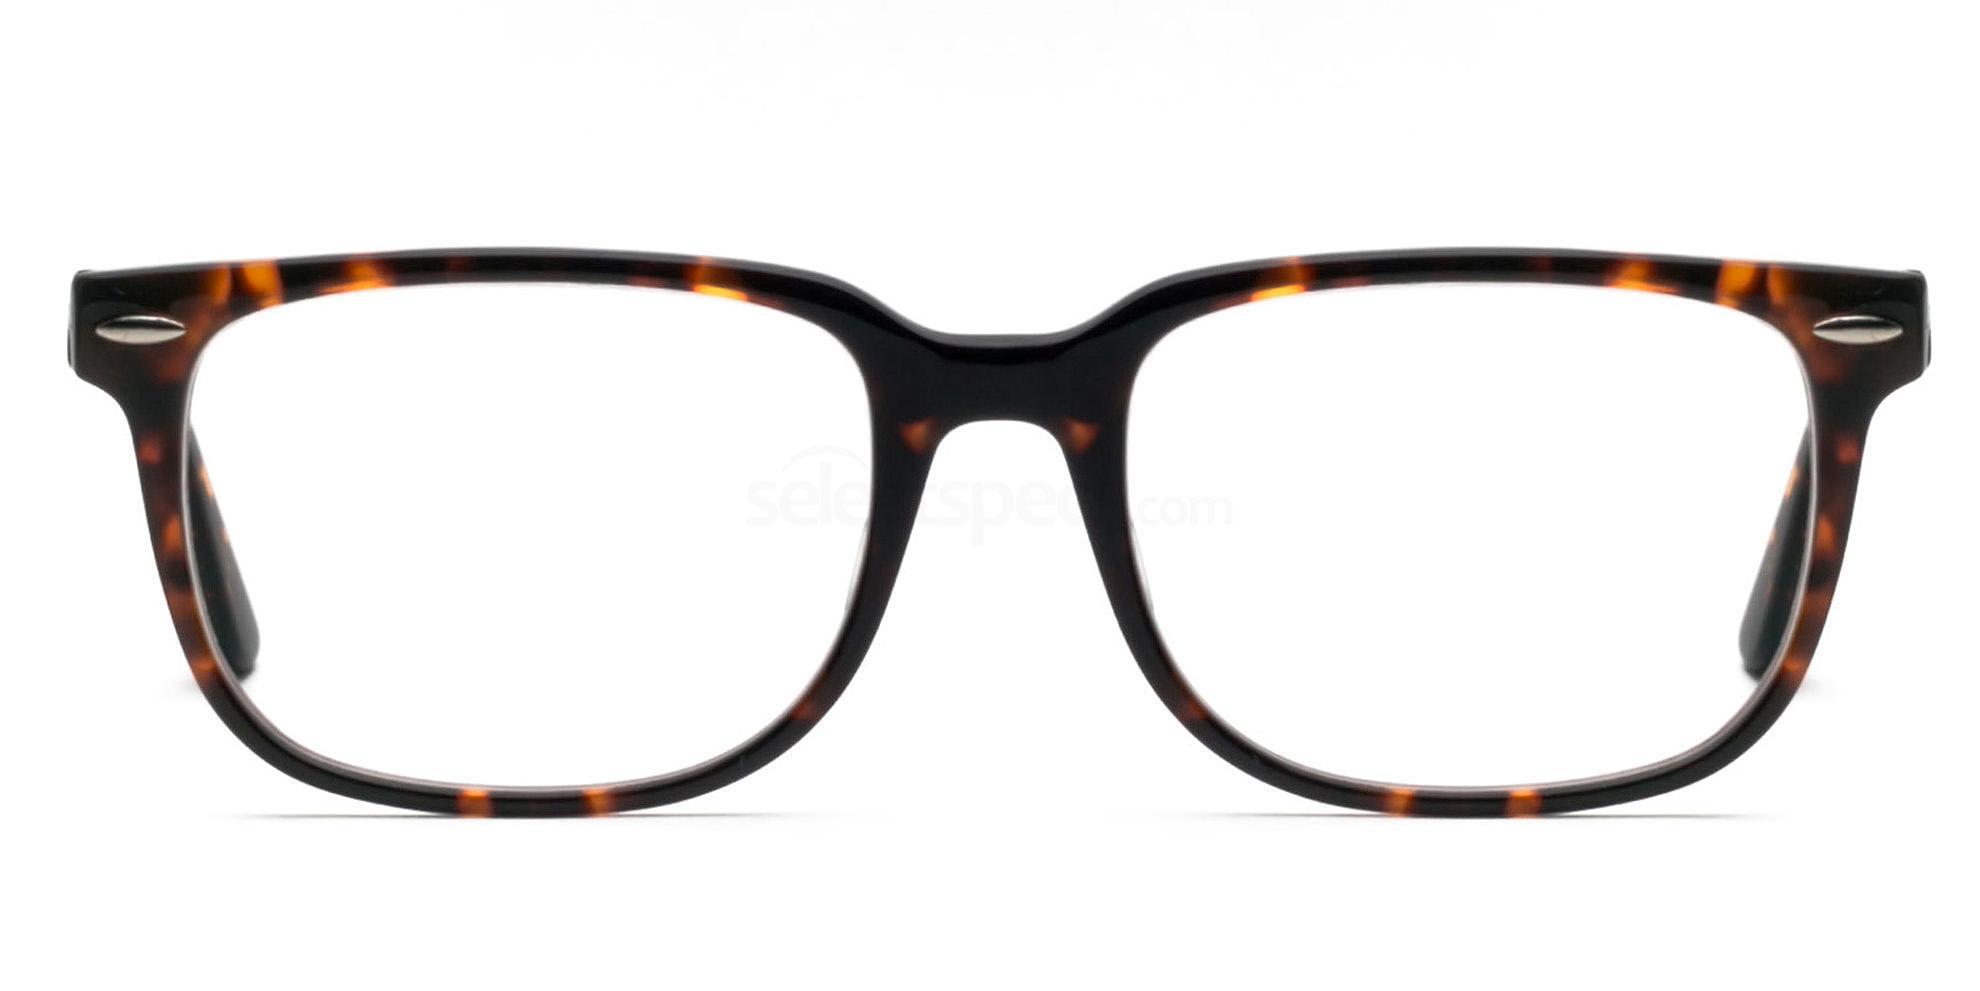 seth rogan glasses